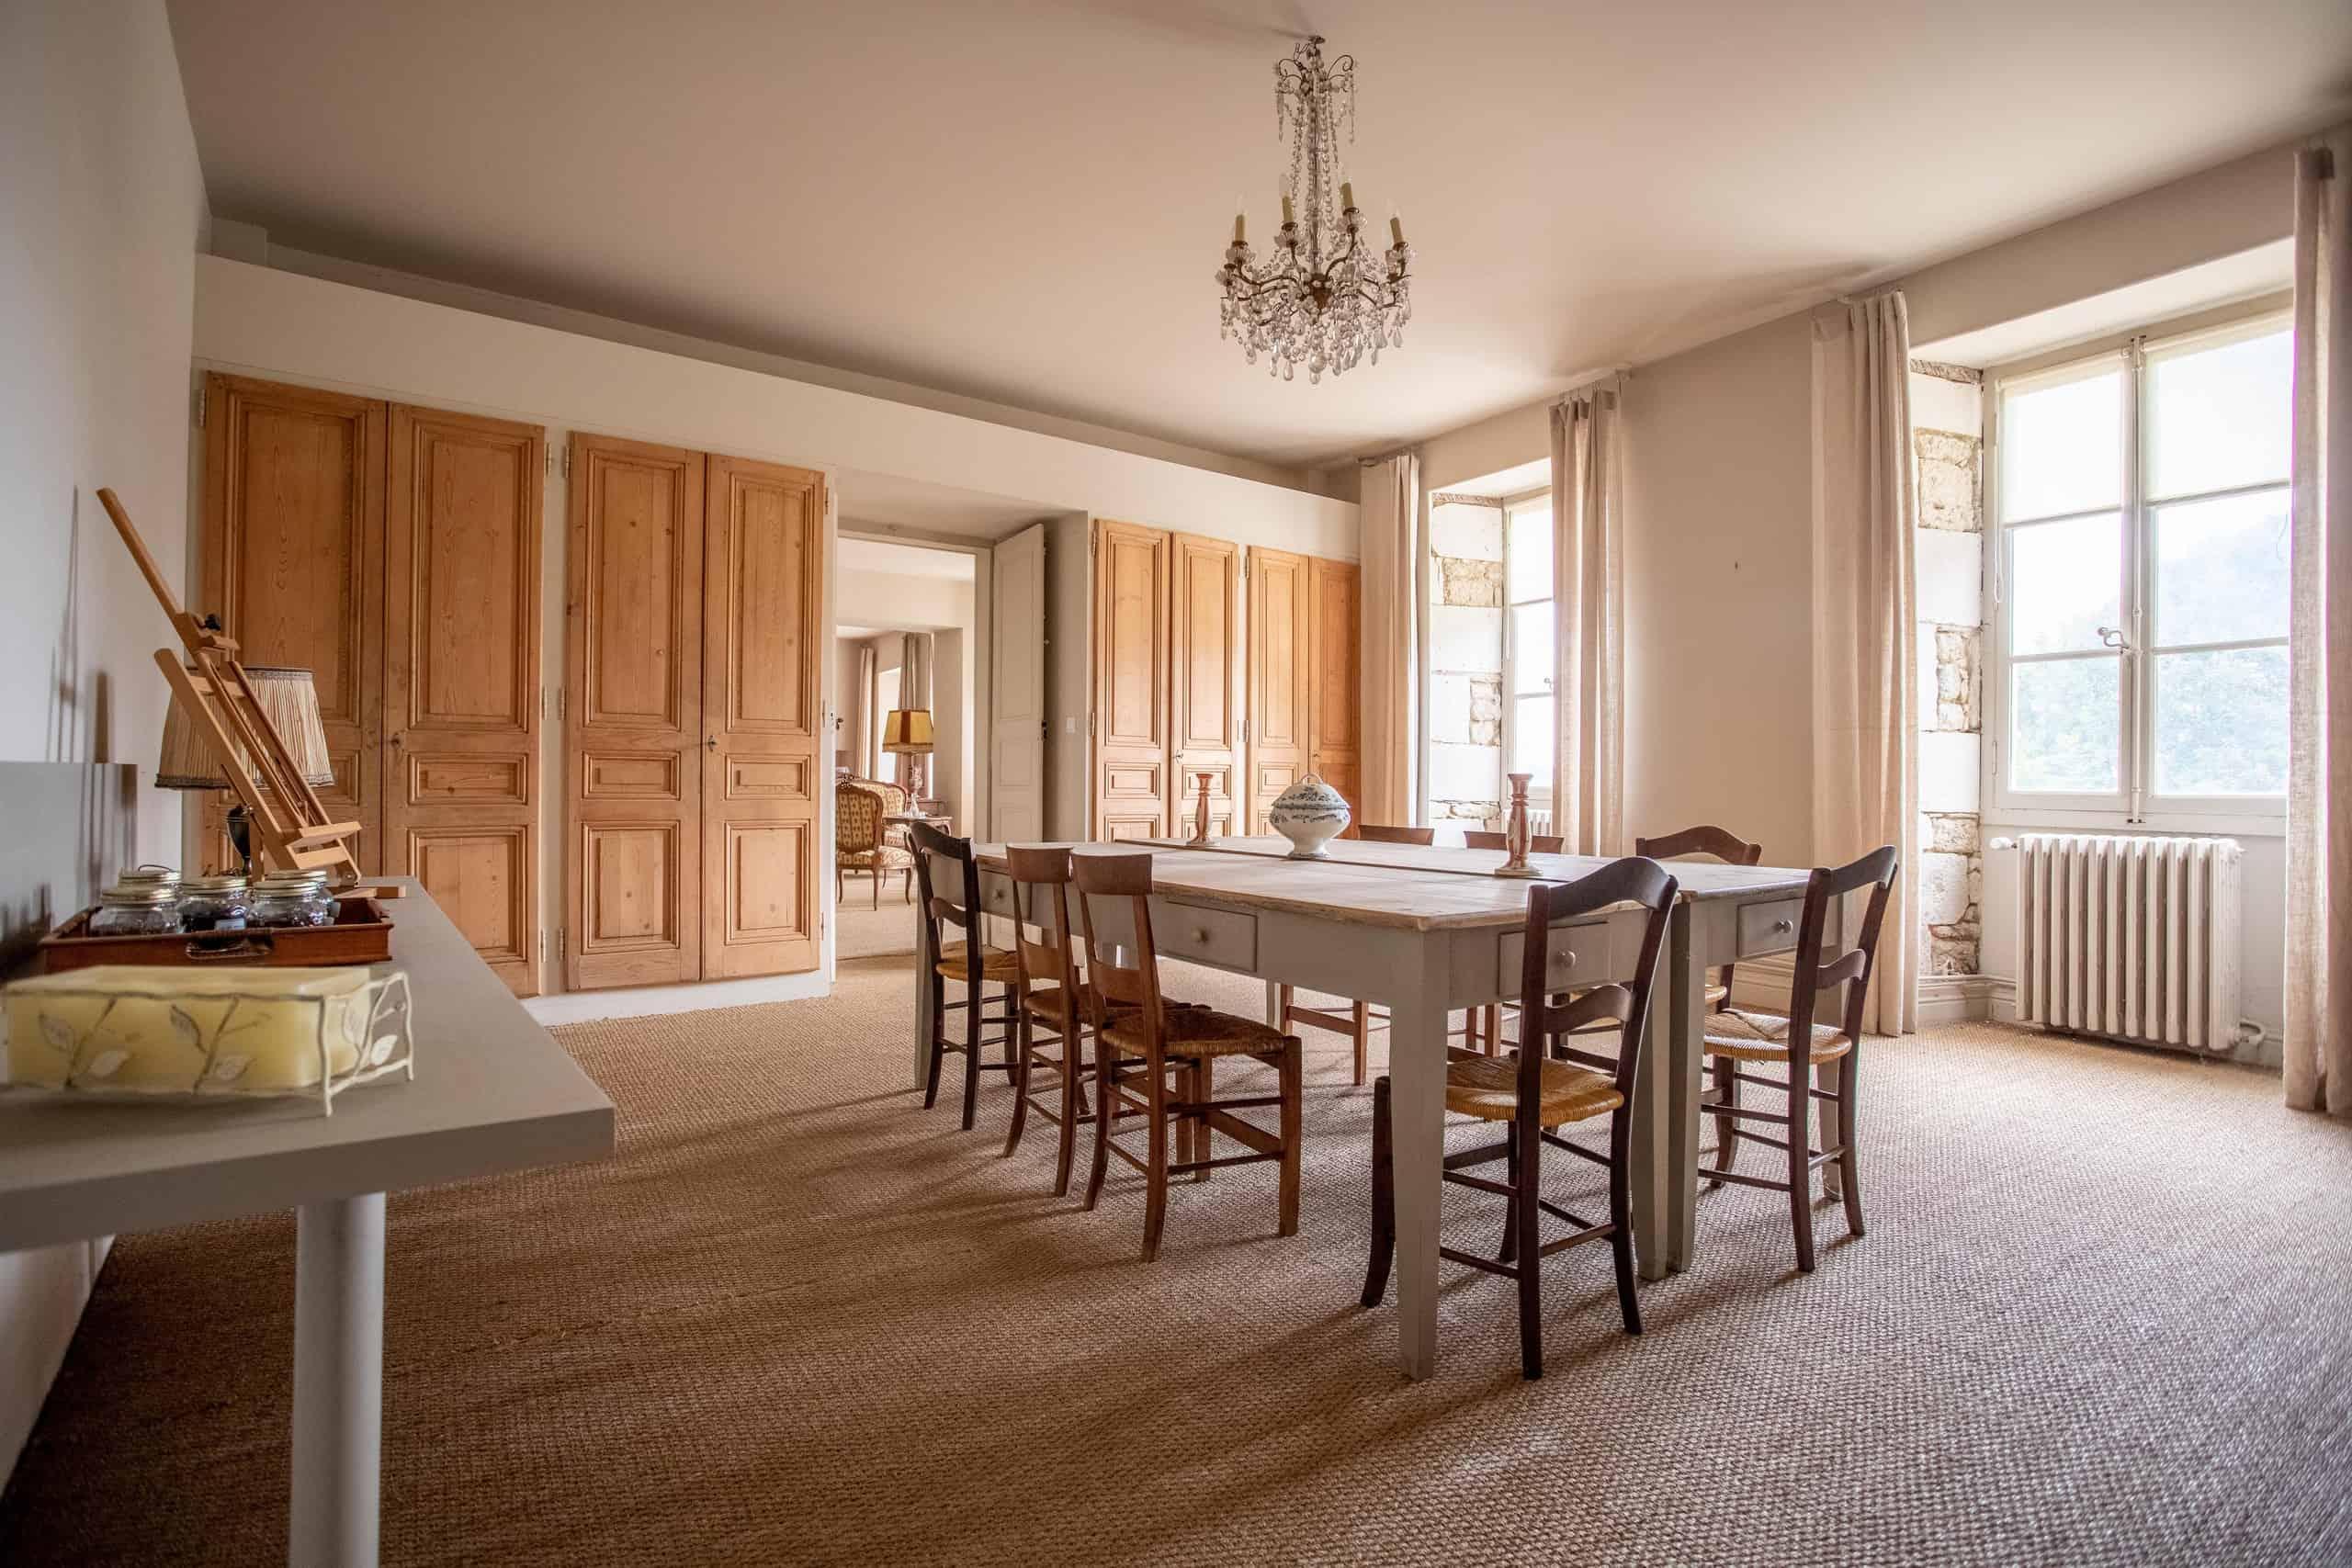 Breakfast-room-WMC110 (1)